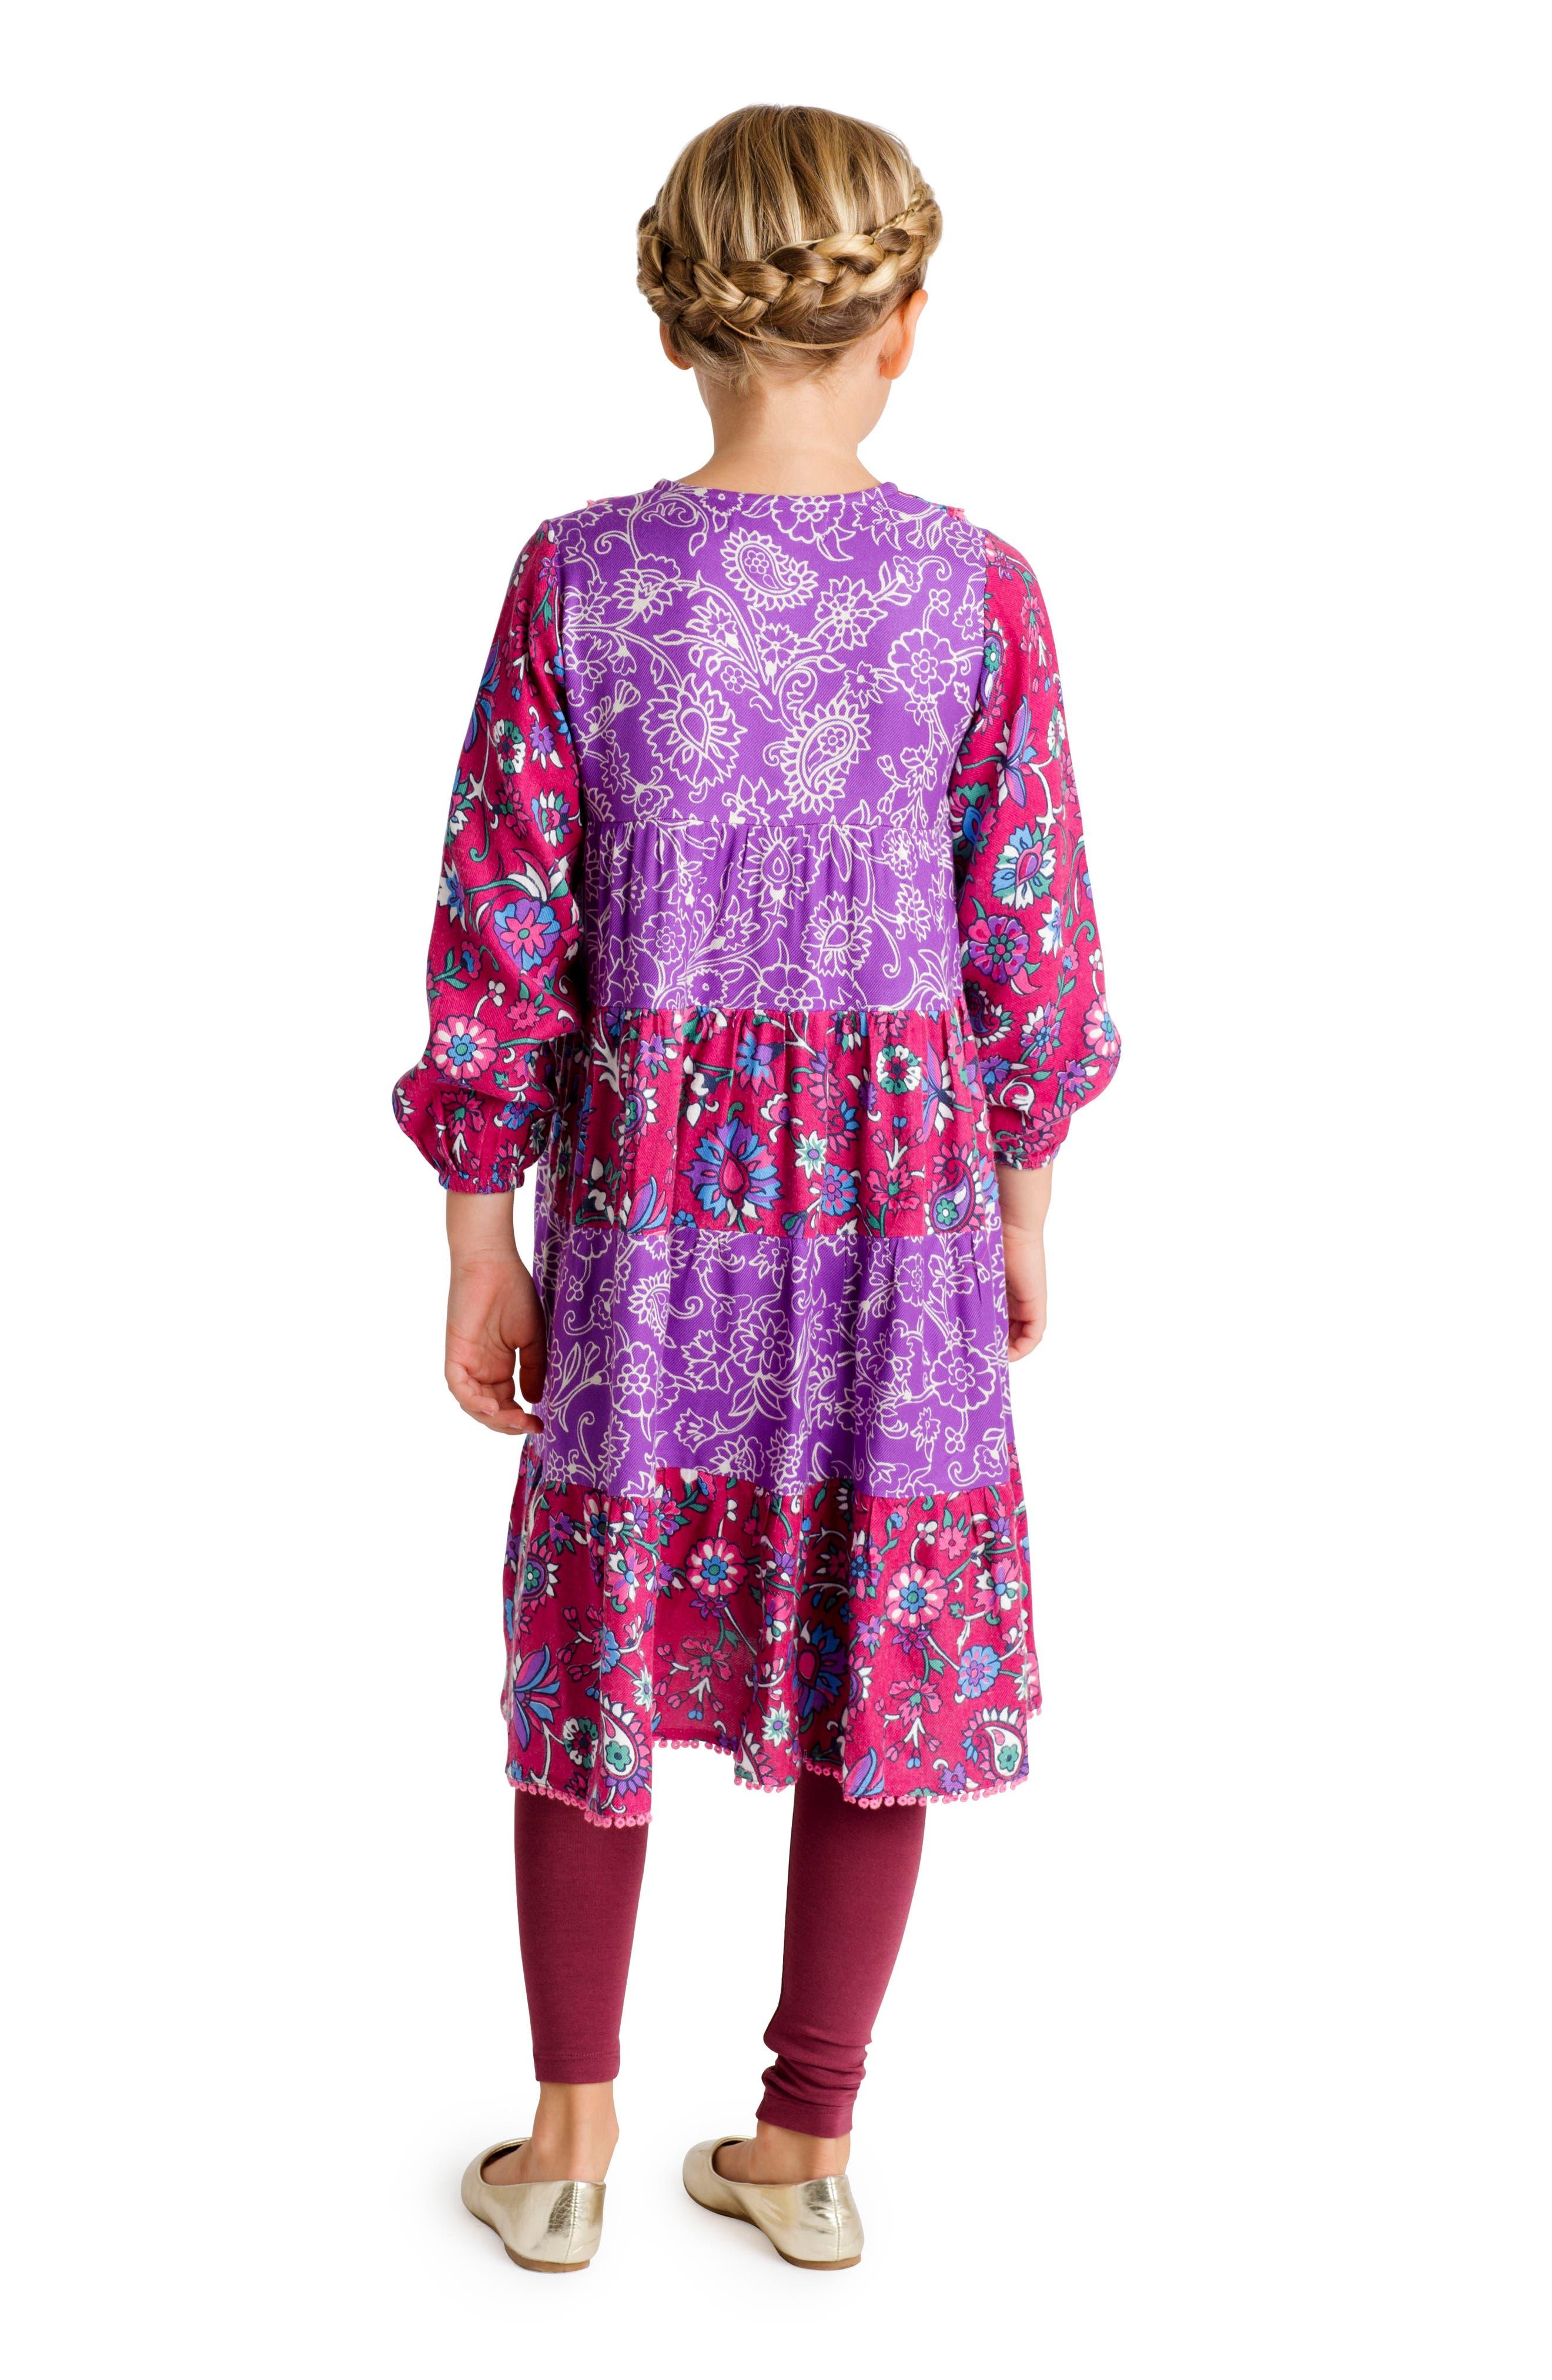 Alternate Image 3  - Masala Baby Tiered Floral Dress (Toddler Girls, Little Girls & Big Girls)